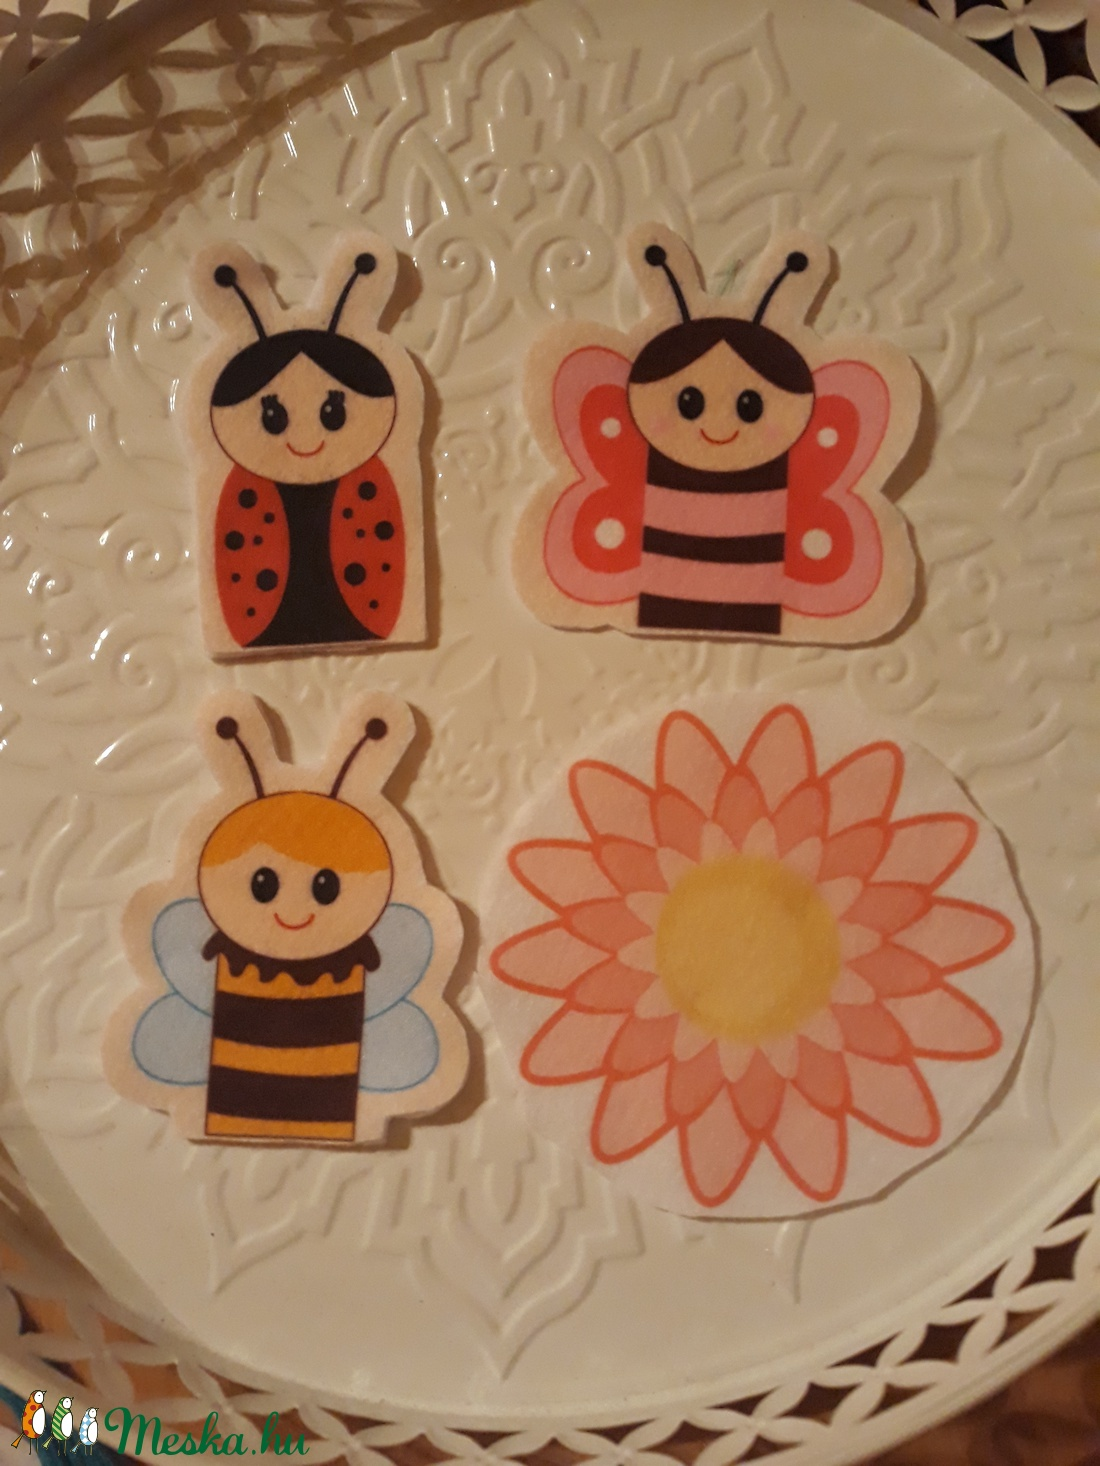 Pillangós ujjbáb . (teo1742) - Meska.hu